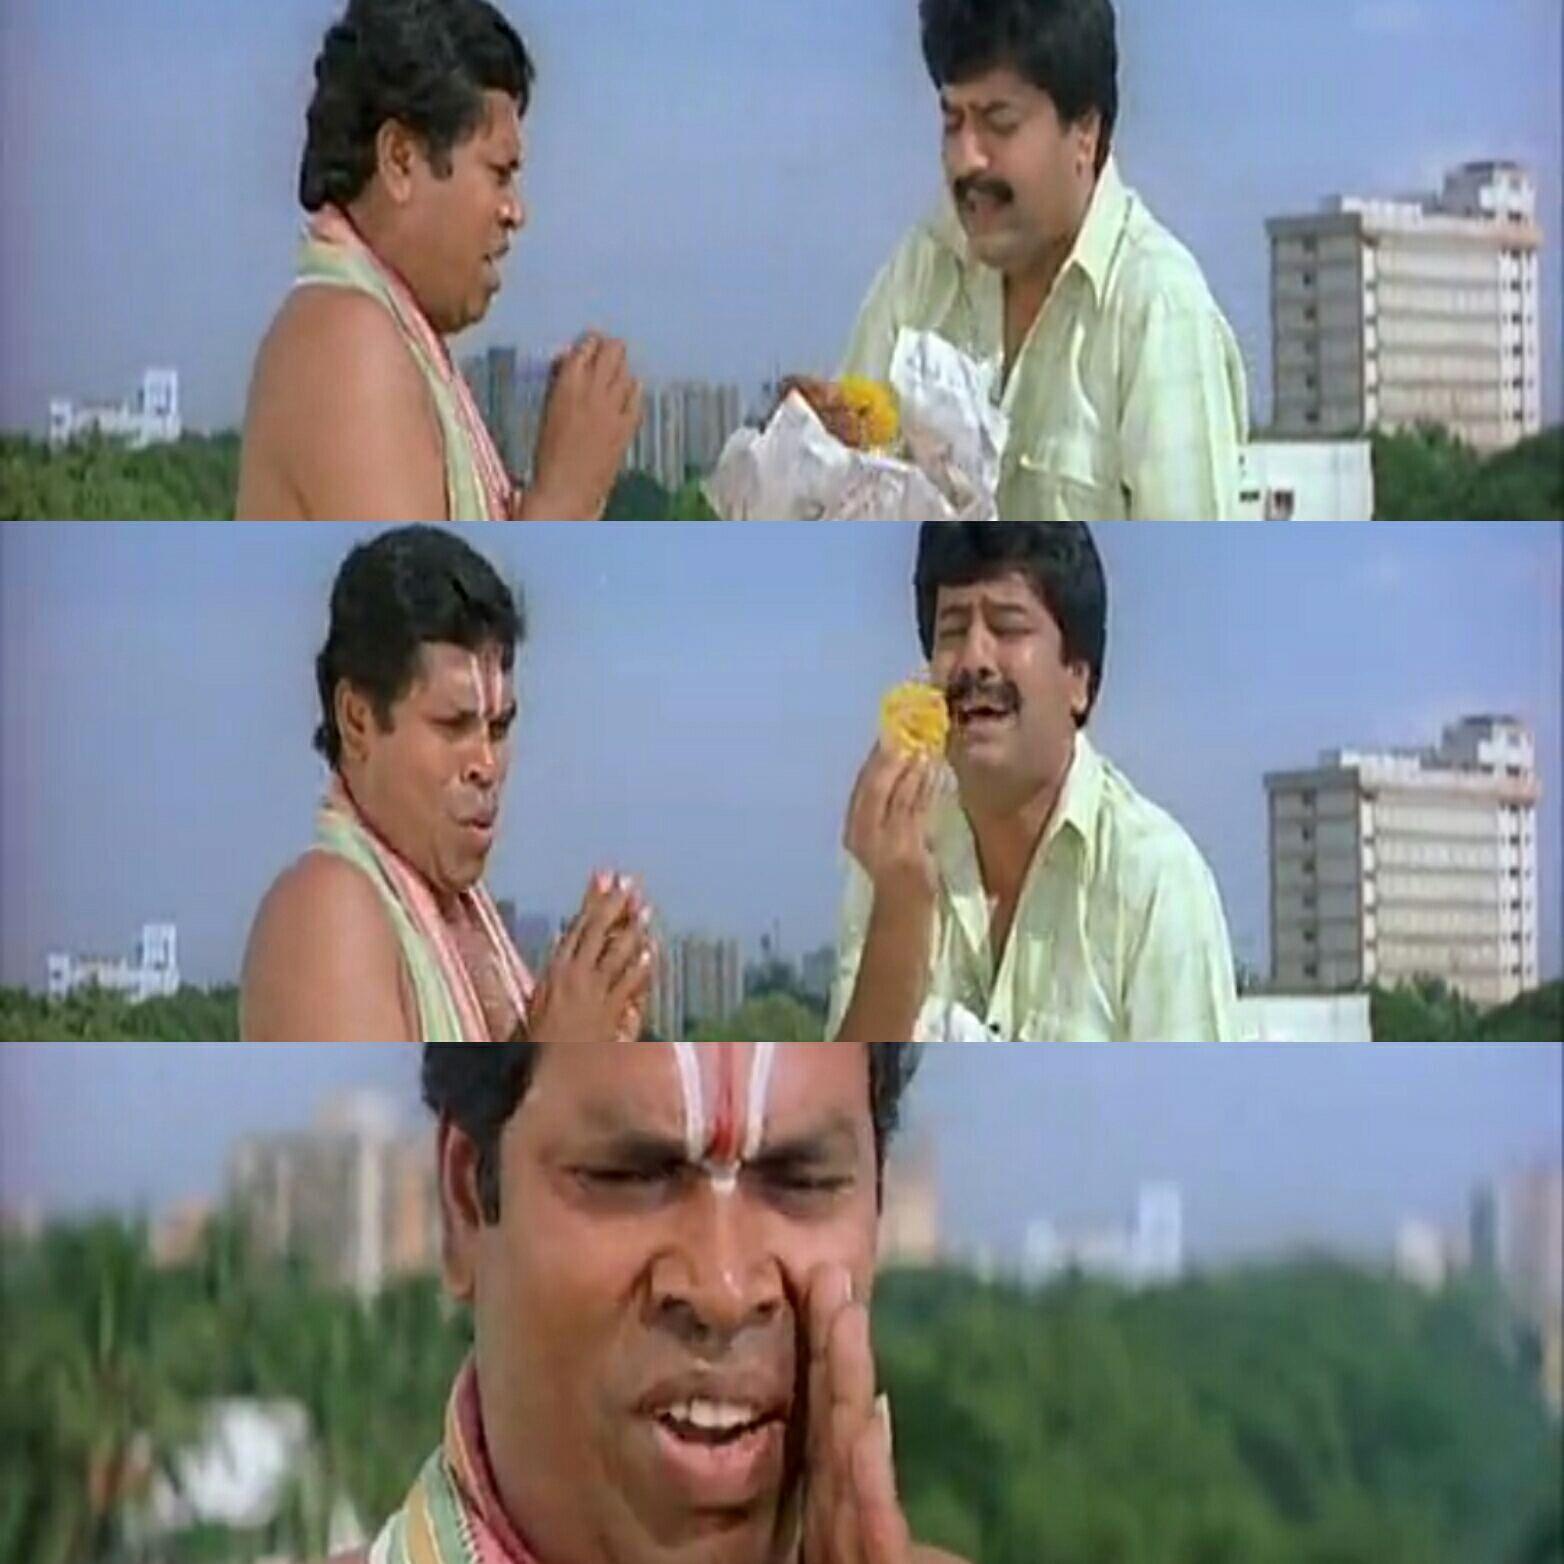 vivek meme template Dhool Meme Template Vikram Vivek